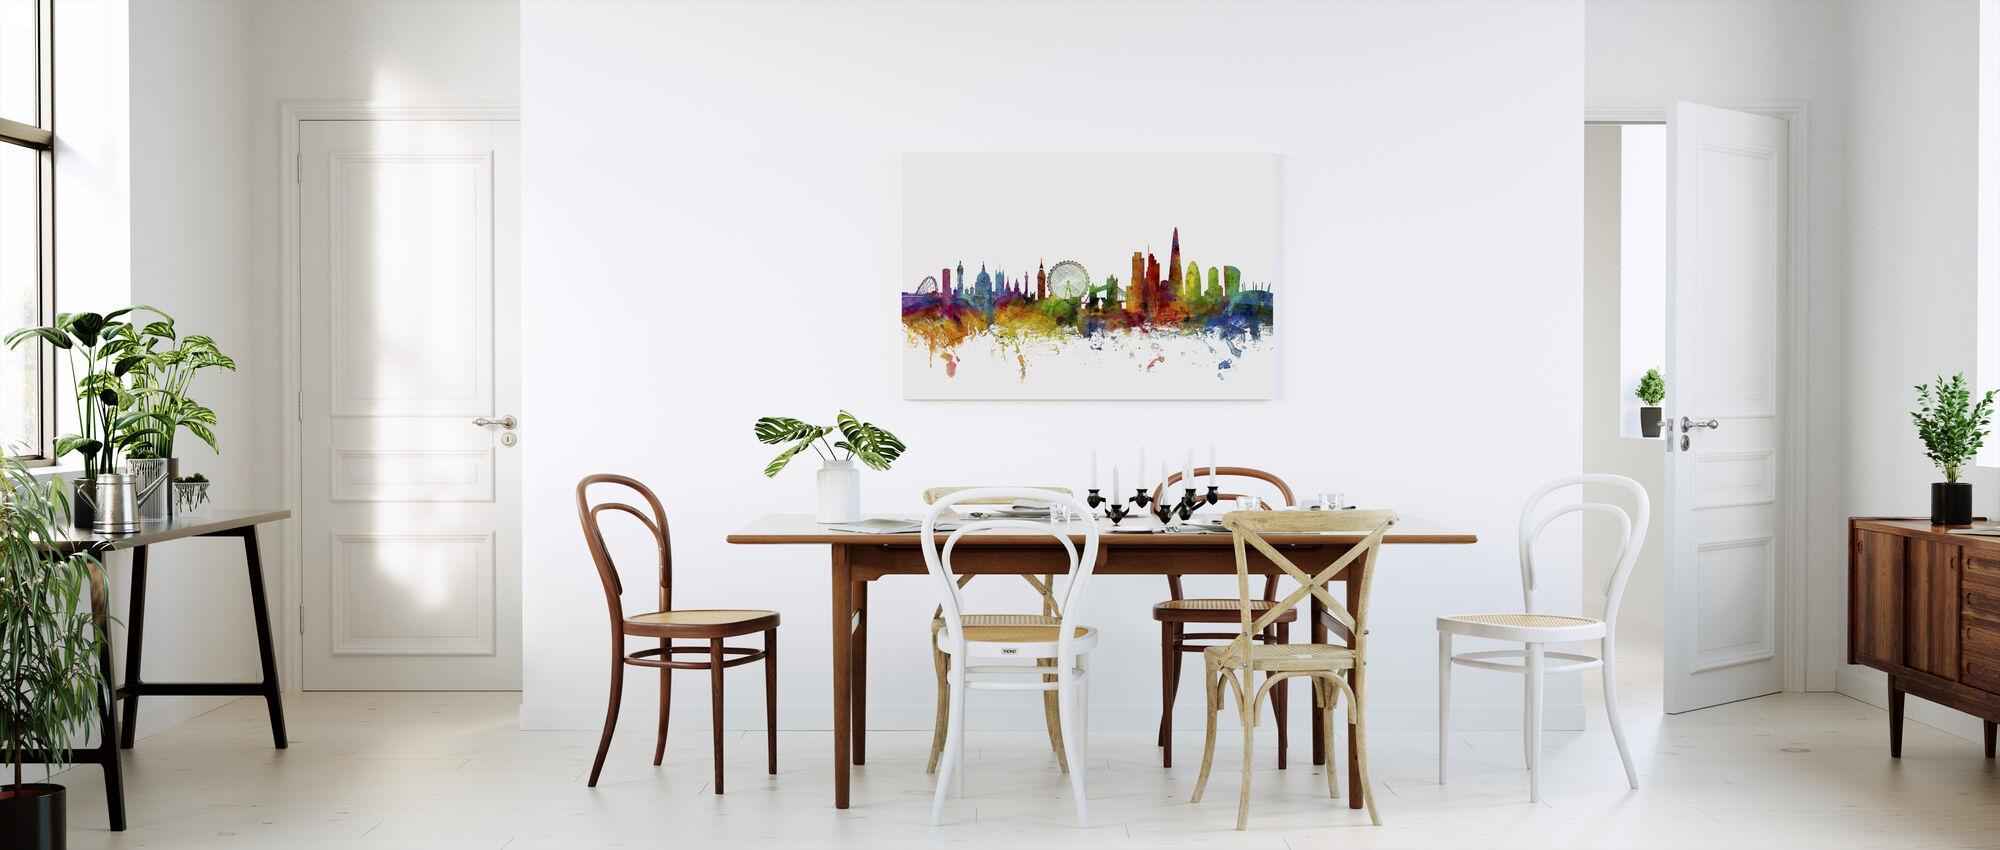 London Skyline 2 - Canvas print - Kitchen